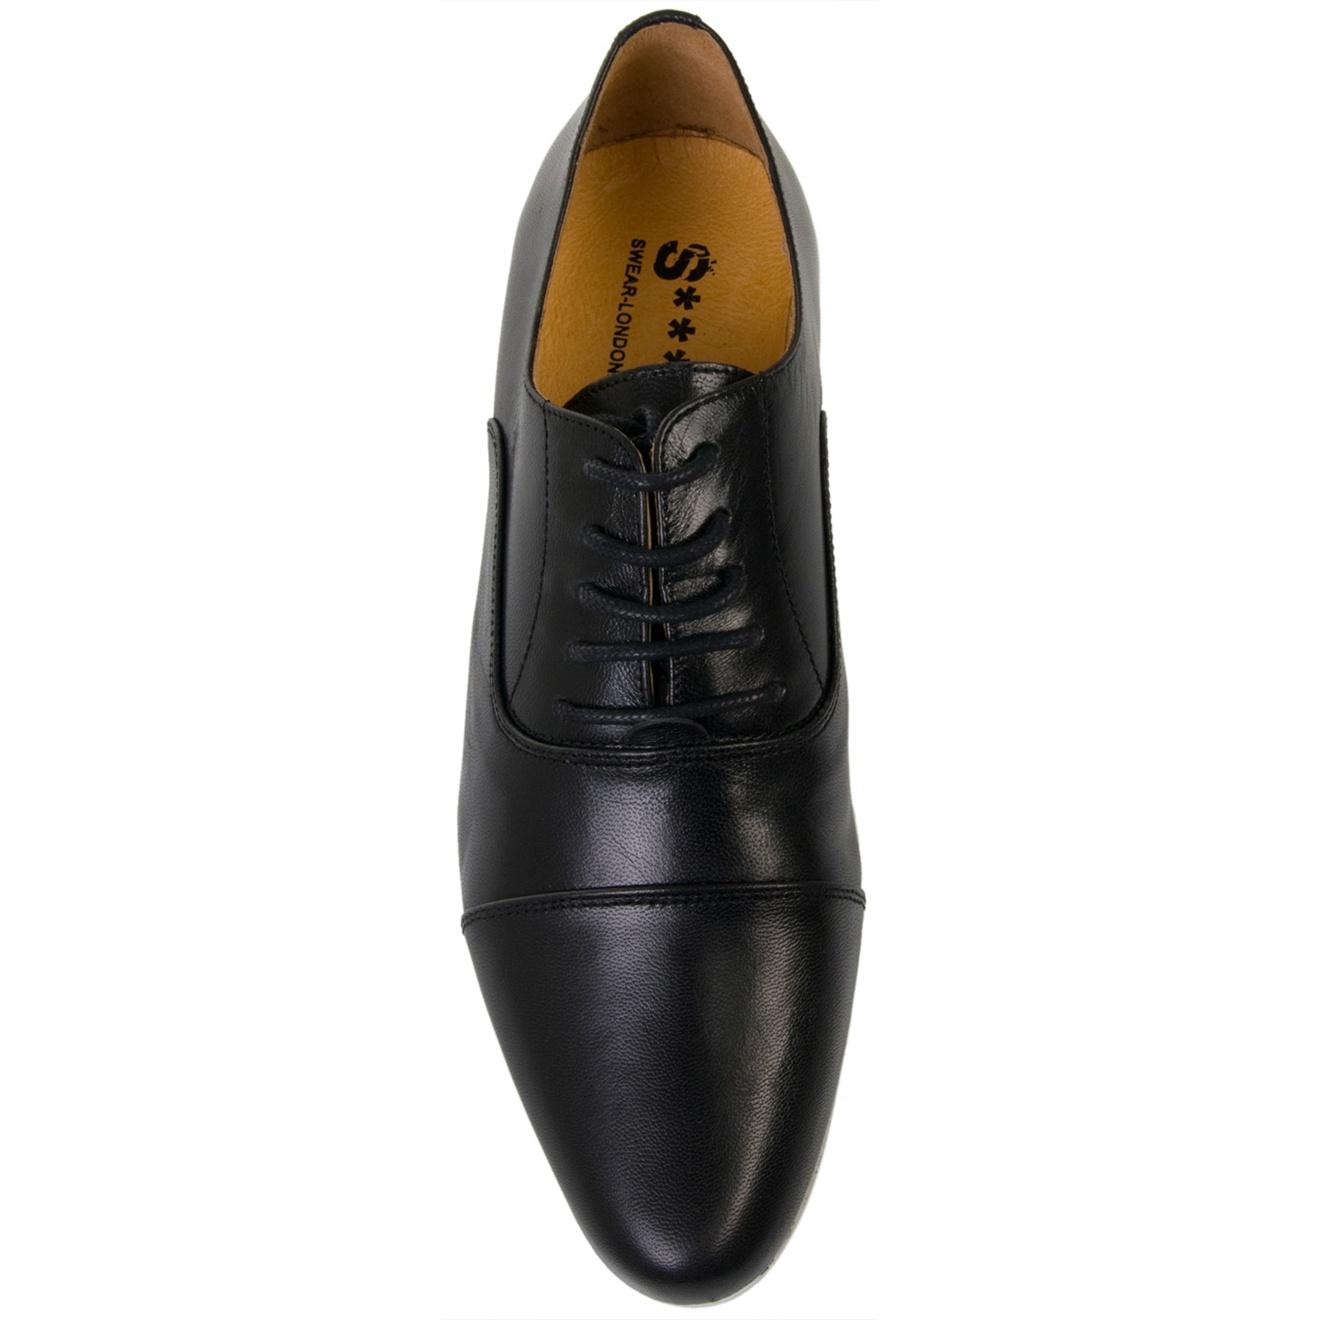 Swear Jimmy 1 Black Leather Lace-up Shoe for Men